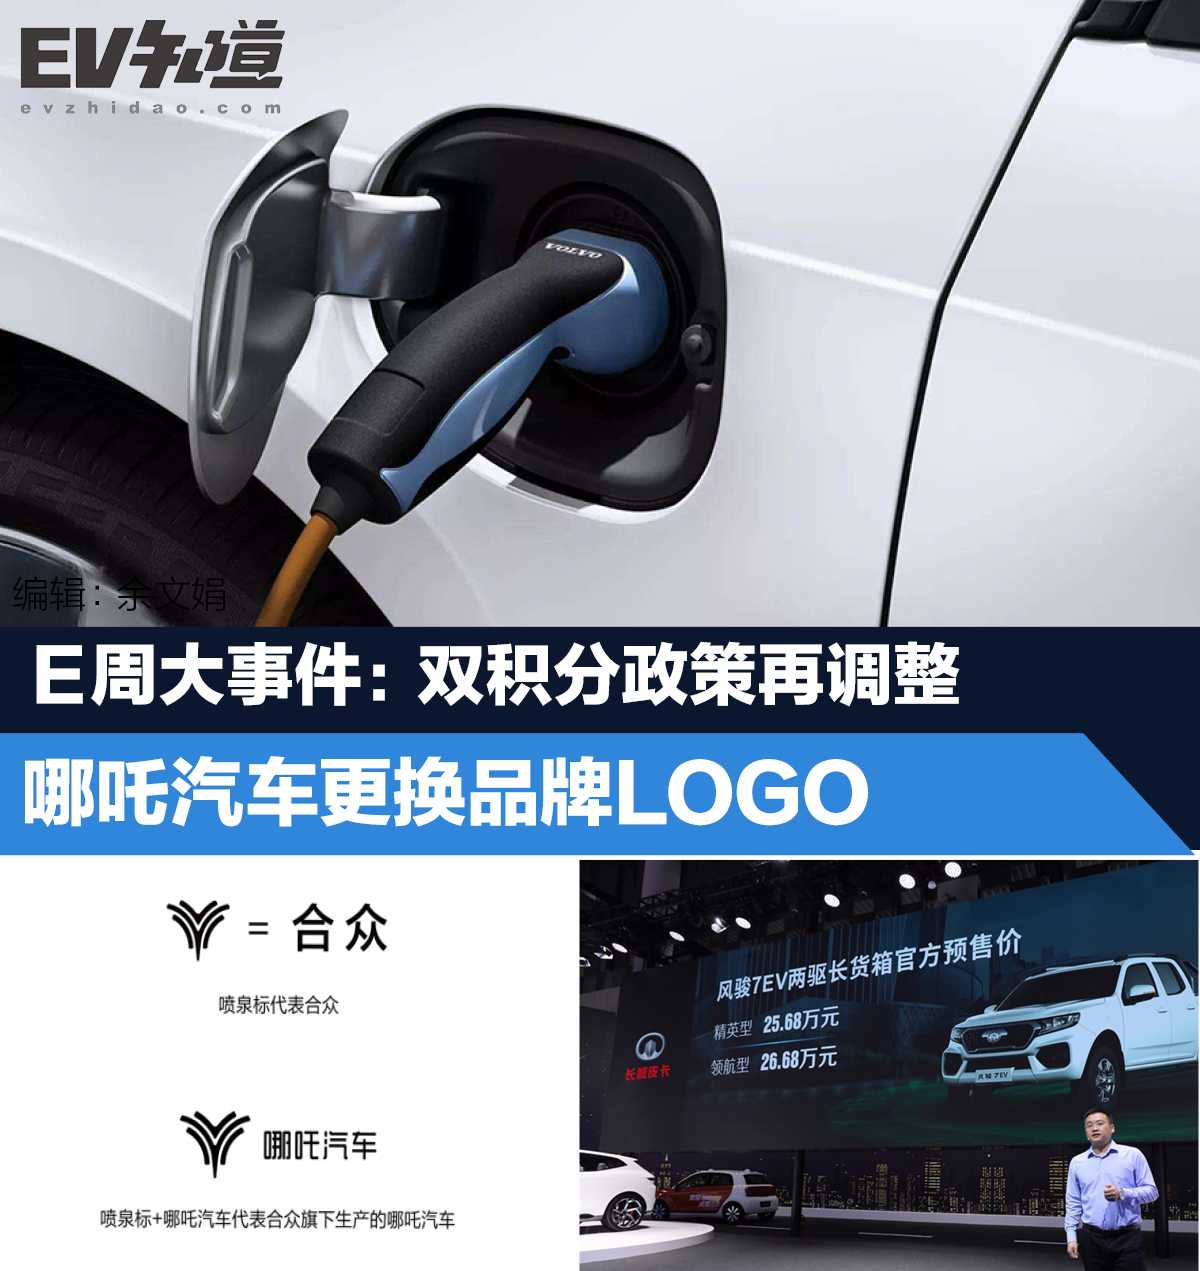 E周大事件:双积分政策再调整/哪吒汽车更换品牌LOGO